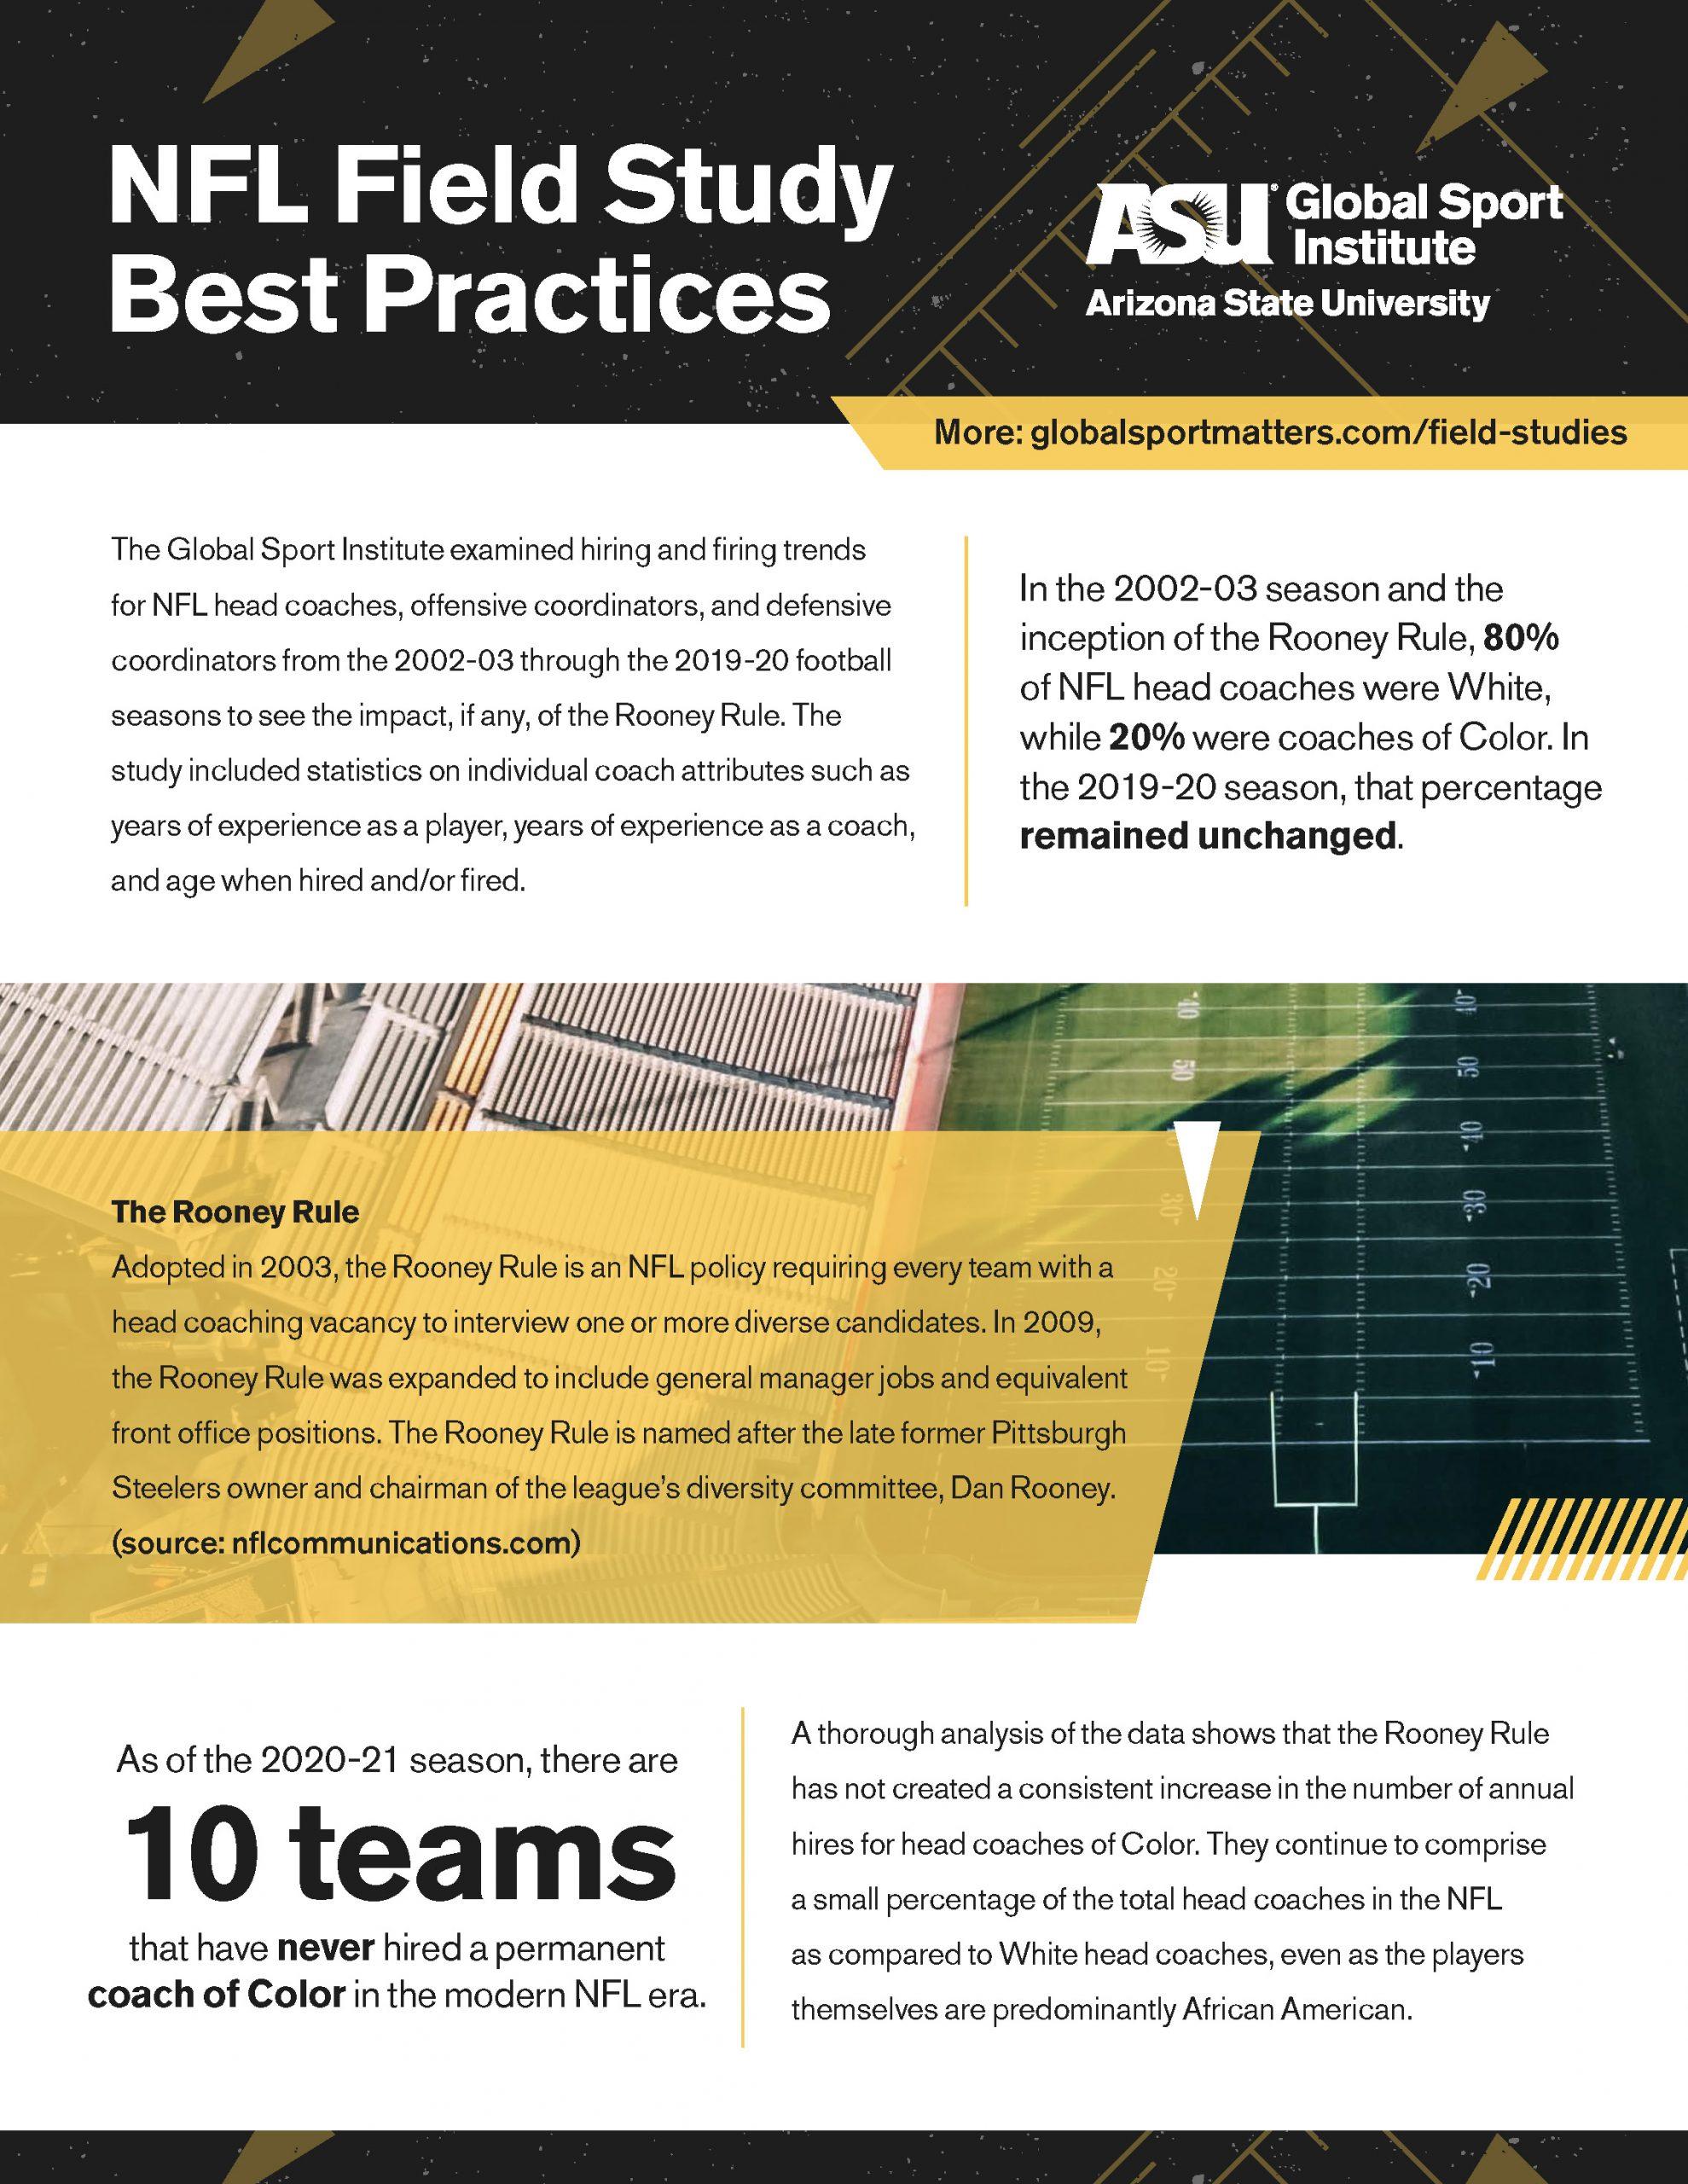 NFL Field Study Best Practices Document